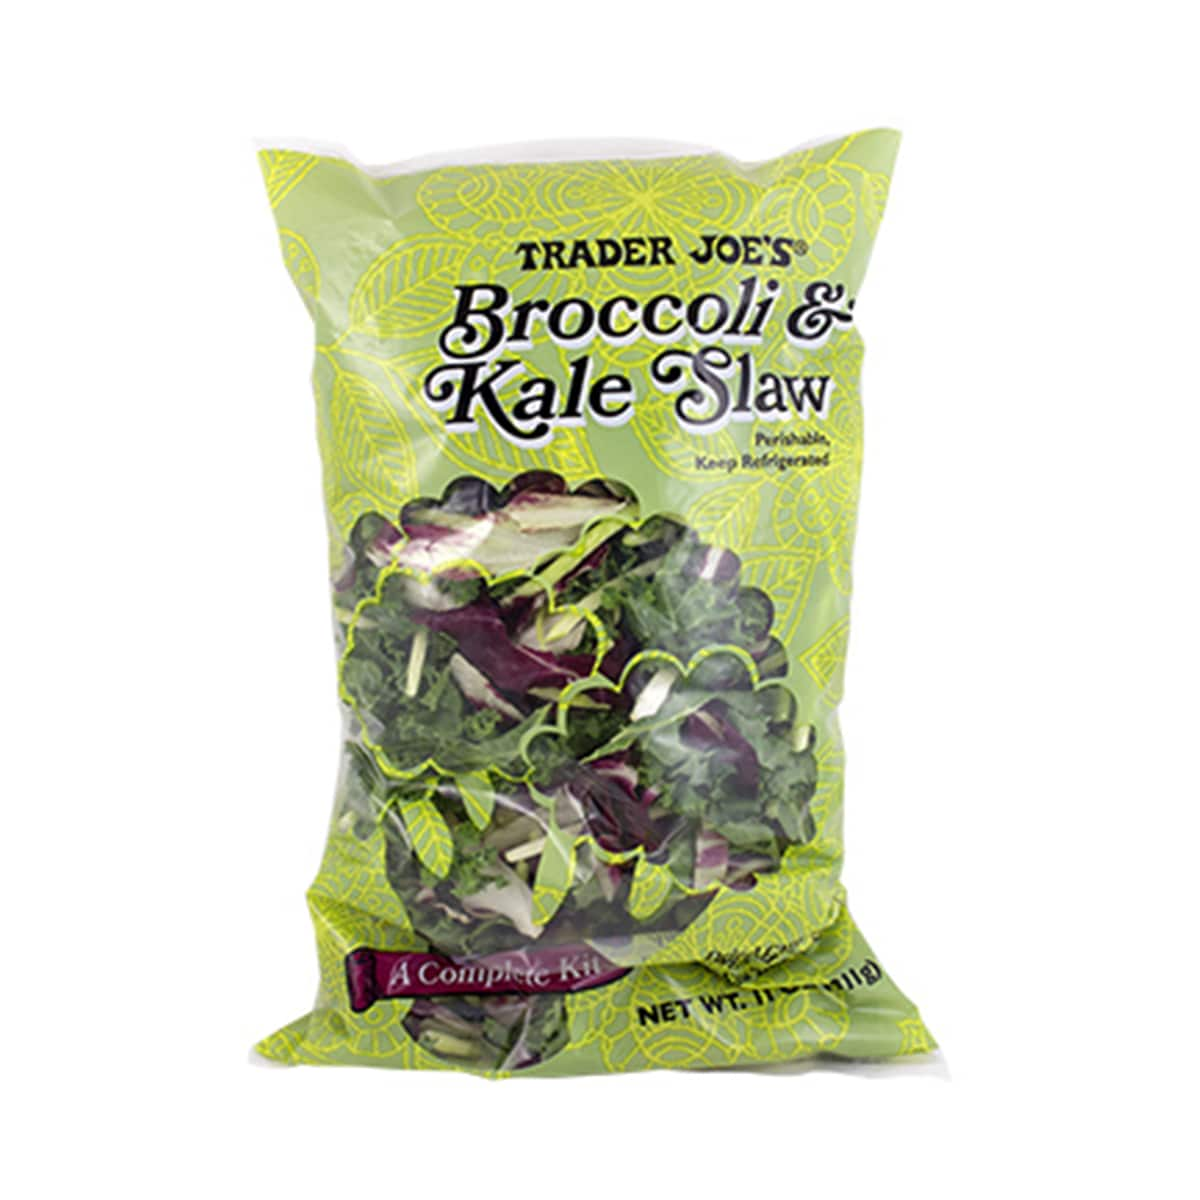 Broccoli & Kale Slaw